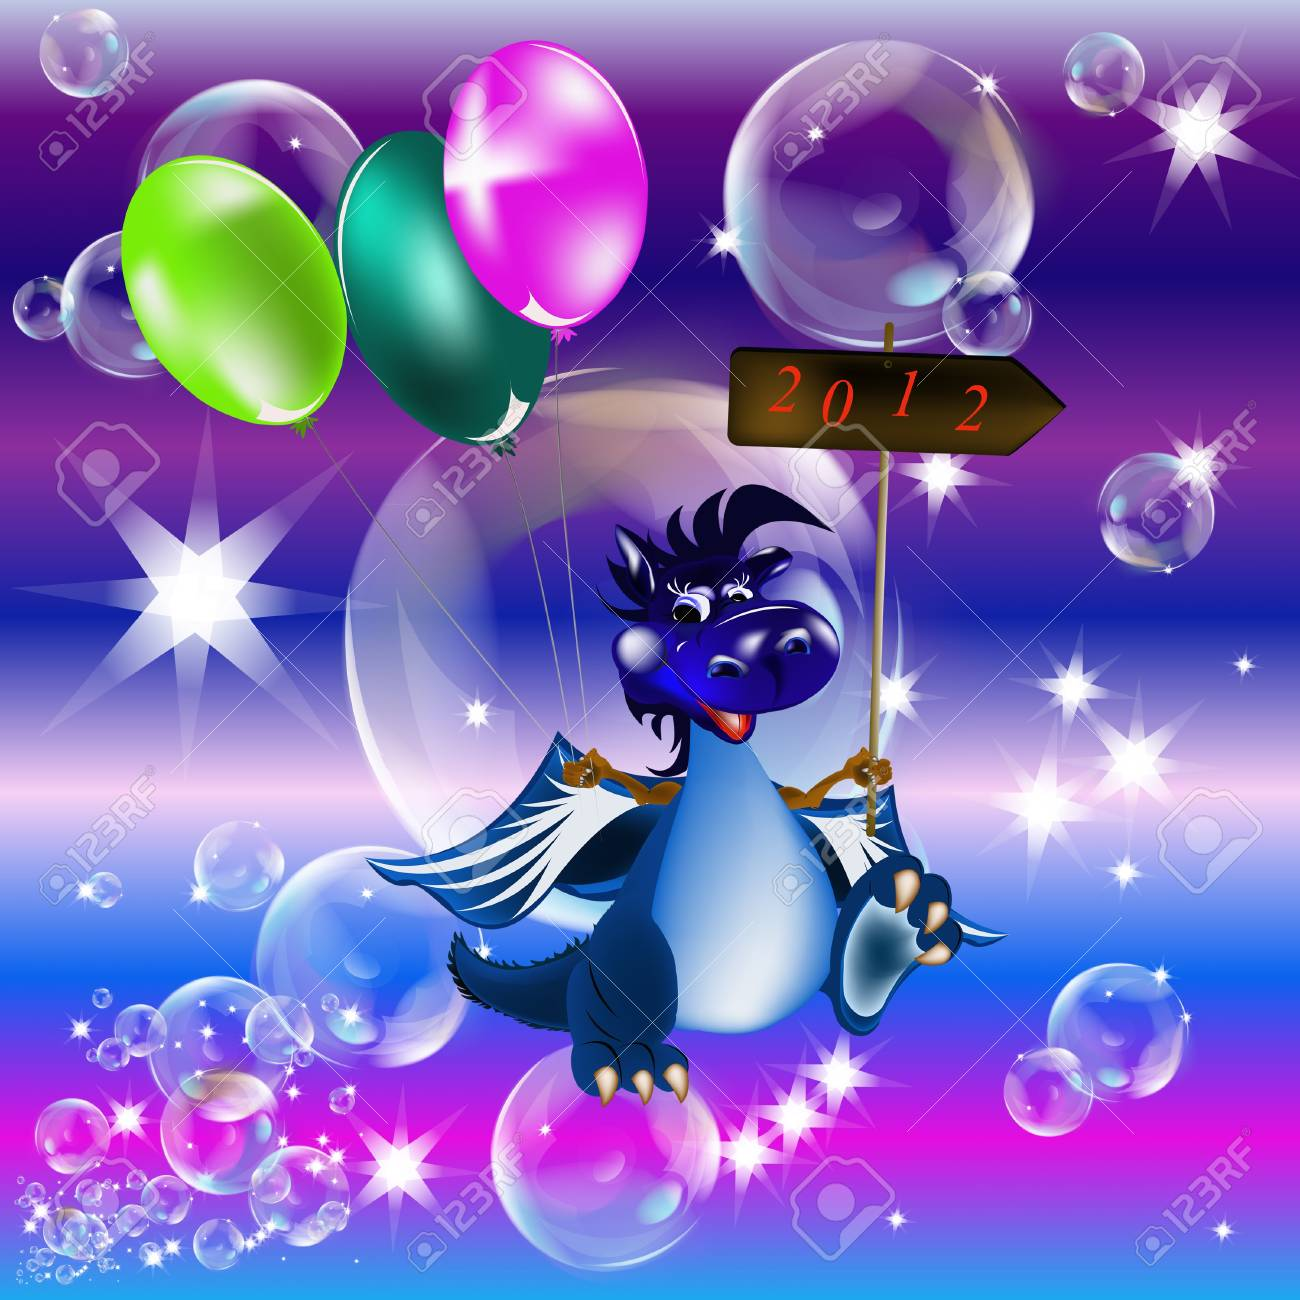 Dark blue dragon a symbol of new 2012 on east calendar Stock Photo - 10968254